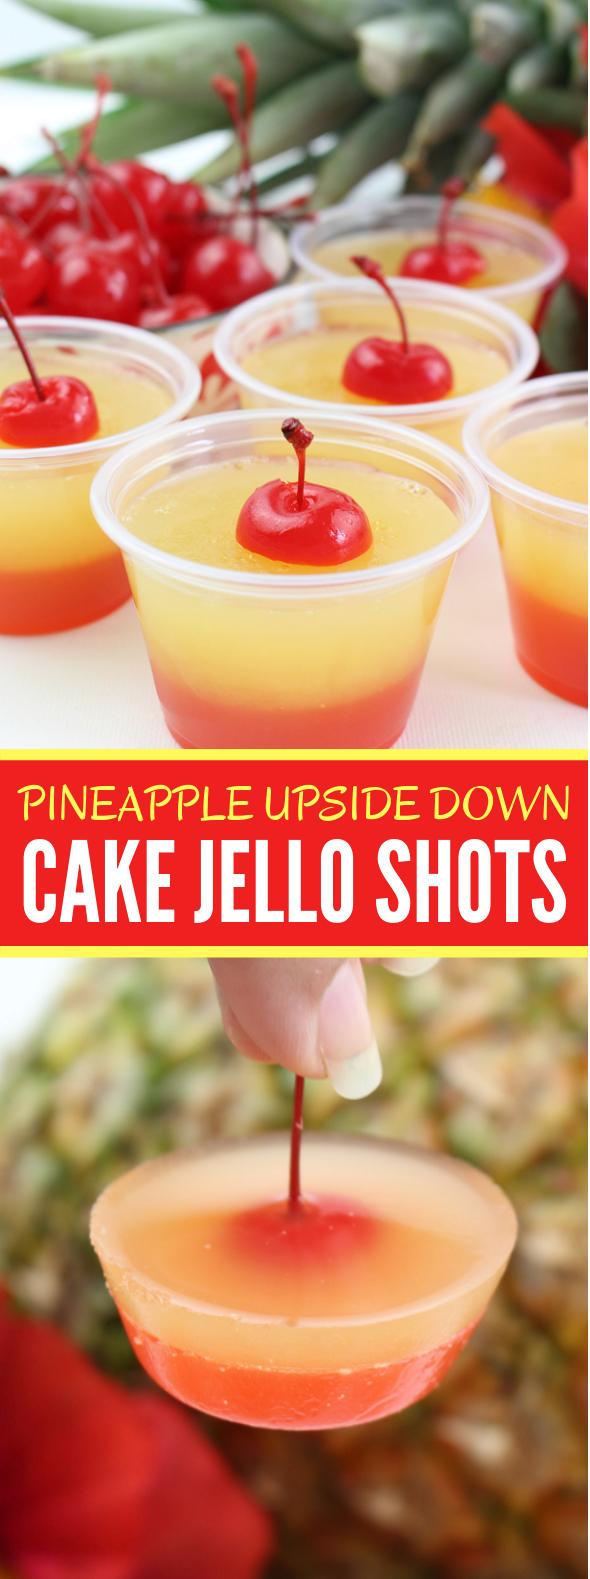 Pineapple Upside Down Cake Jello Shots #drinks #desserts